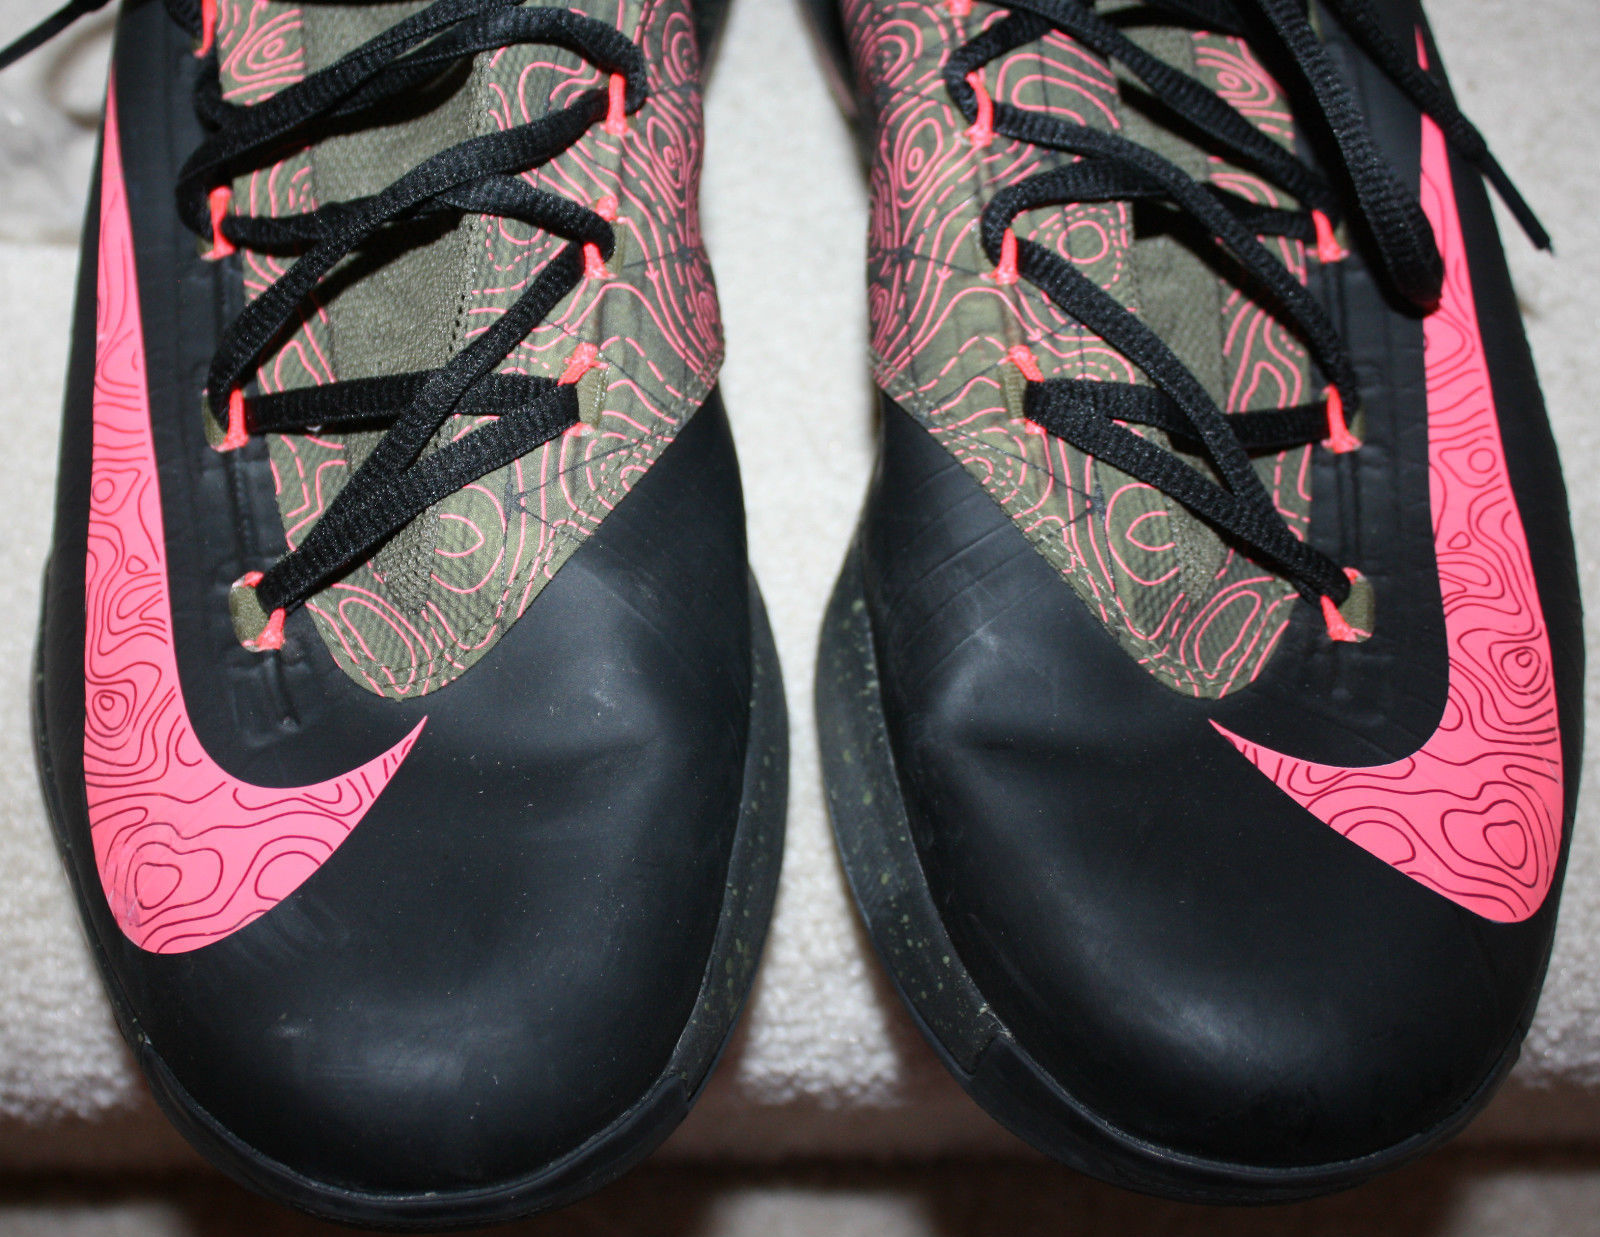 Nike Men's KD VI Kevin Durant Meteorology $224 Black Atomic Red Medium Olive 14M